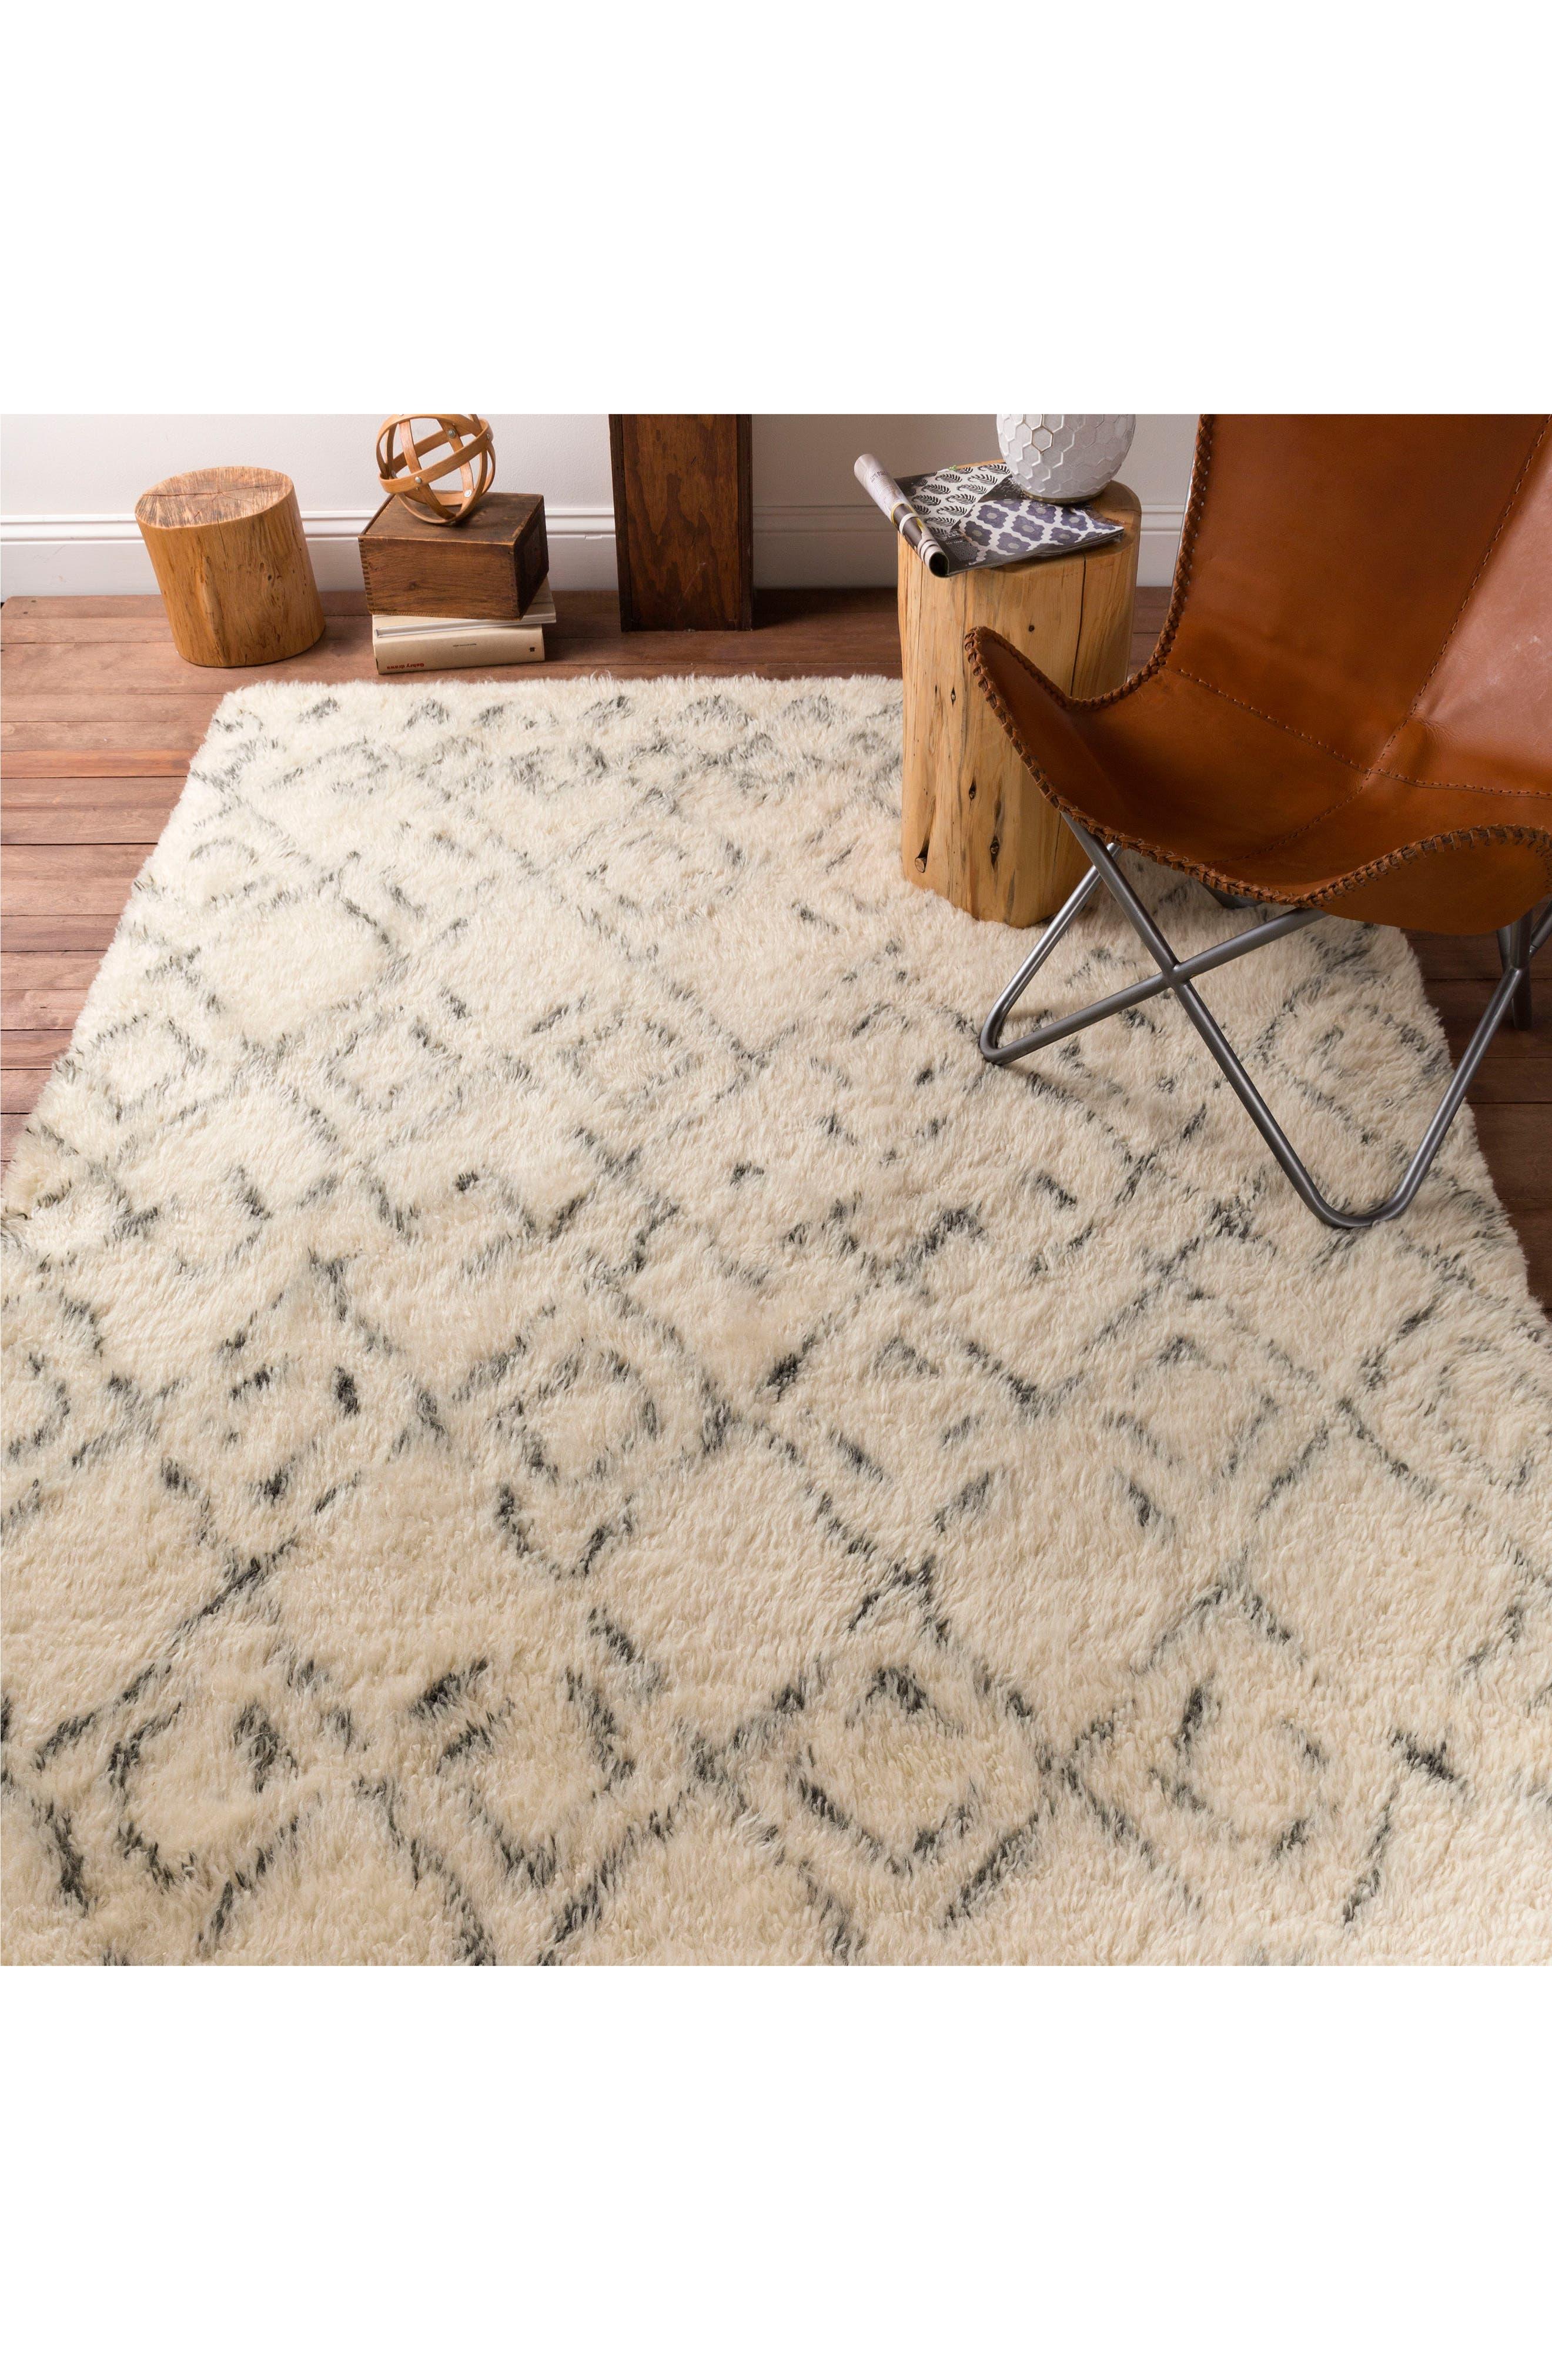 'Tasman' New Zealand Wool Rug,                             Alternate thumbnail 2, color,                             IVORY/ CHARCOAL